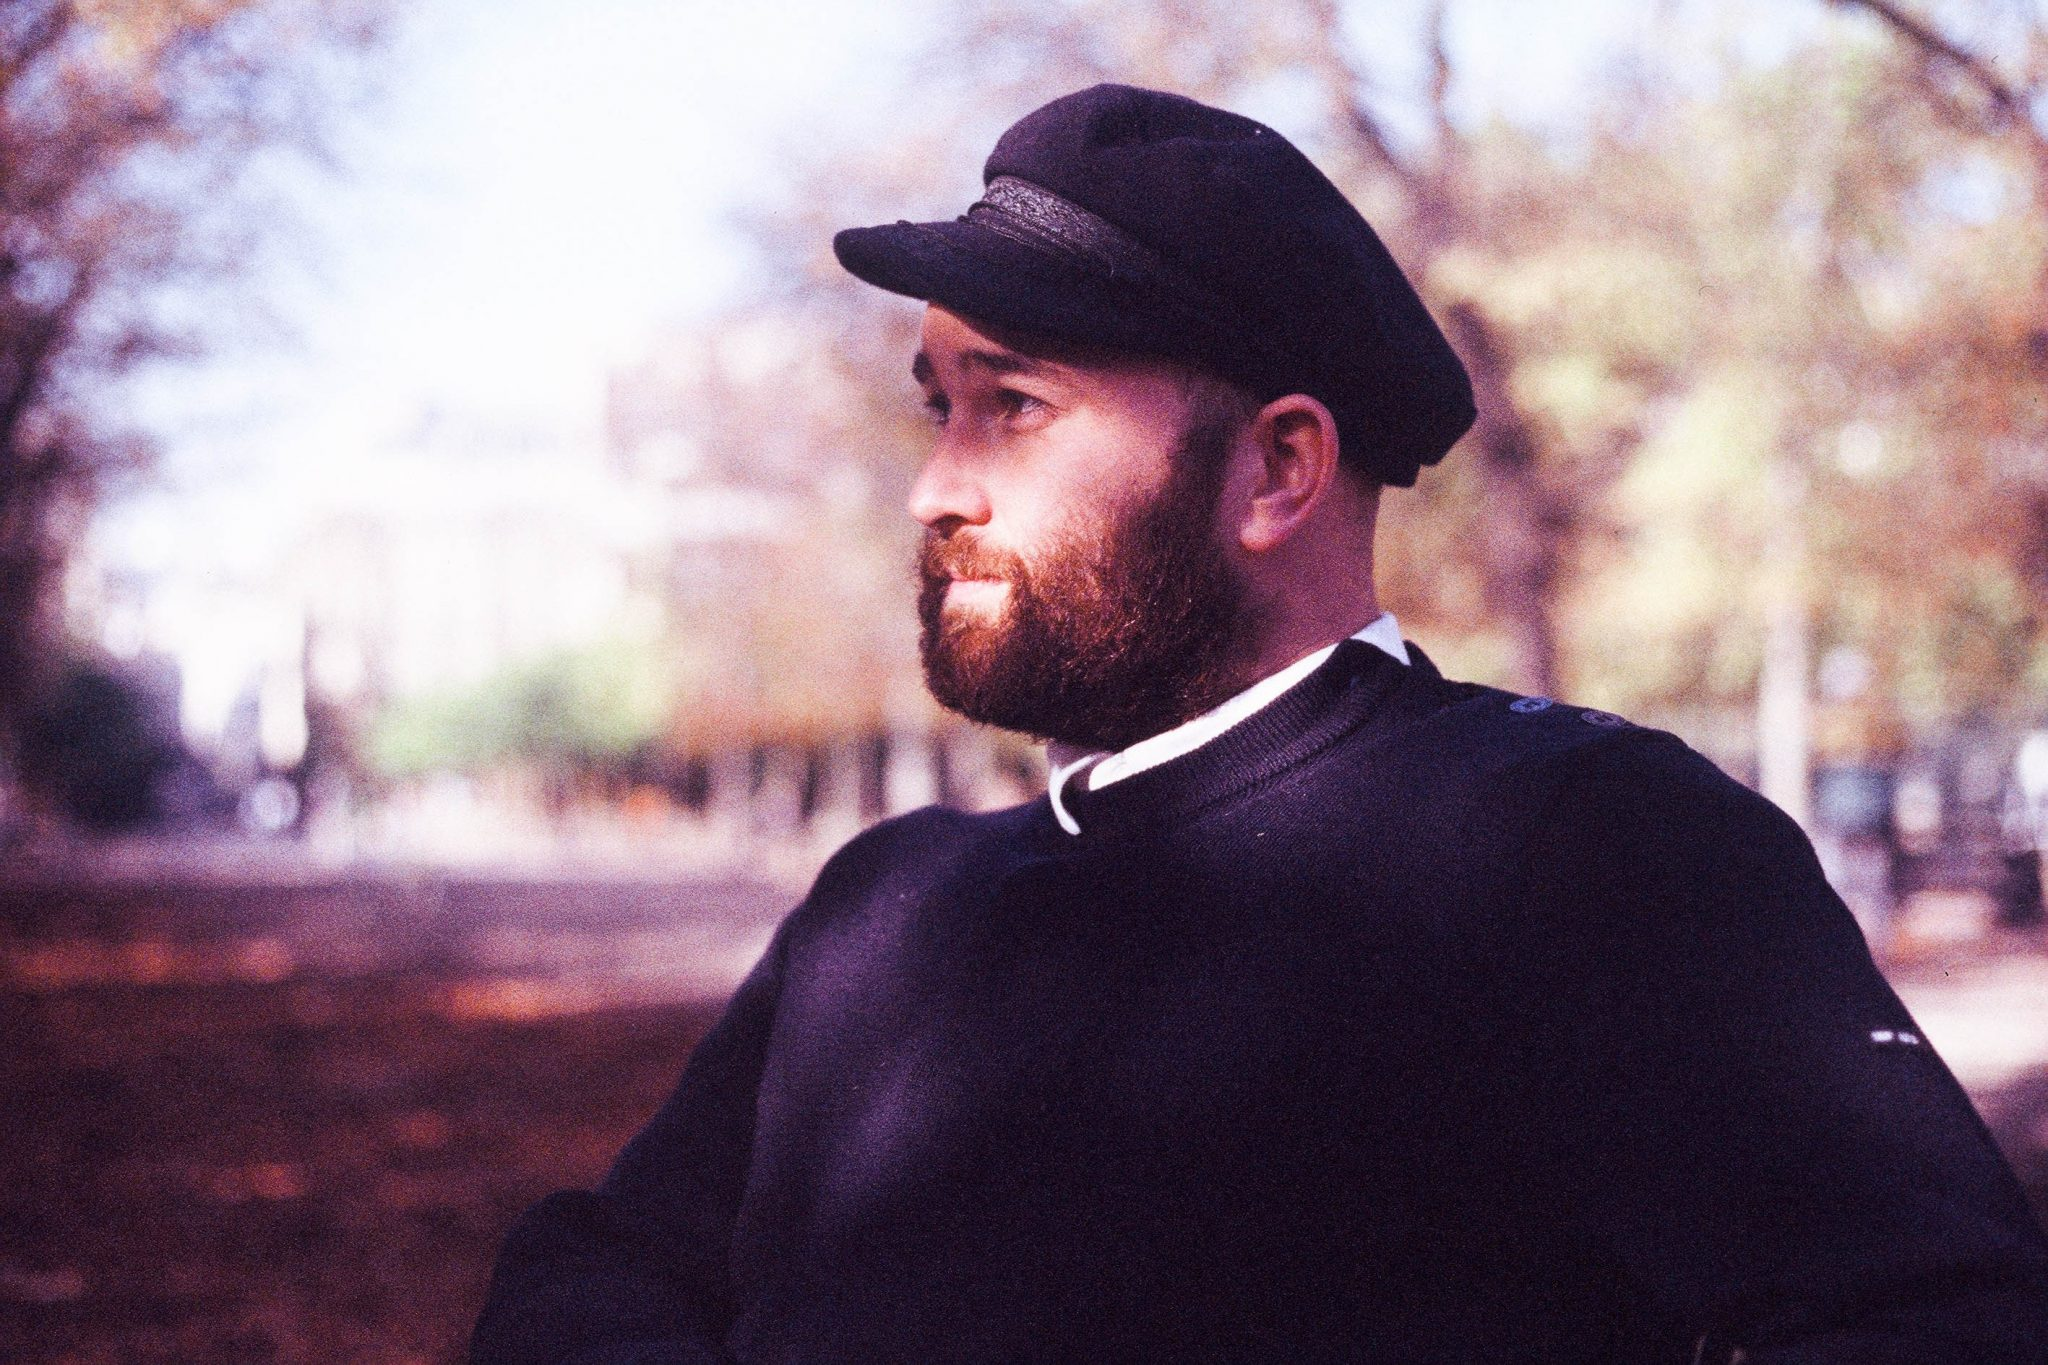 Lewis Ewans